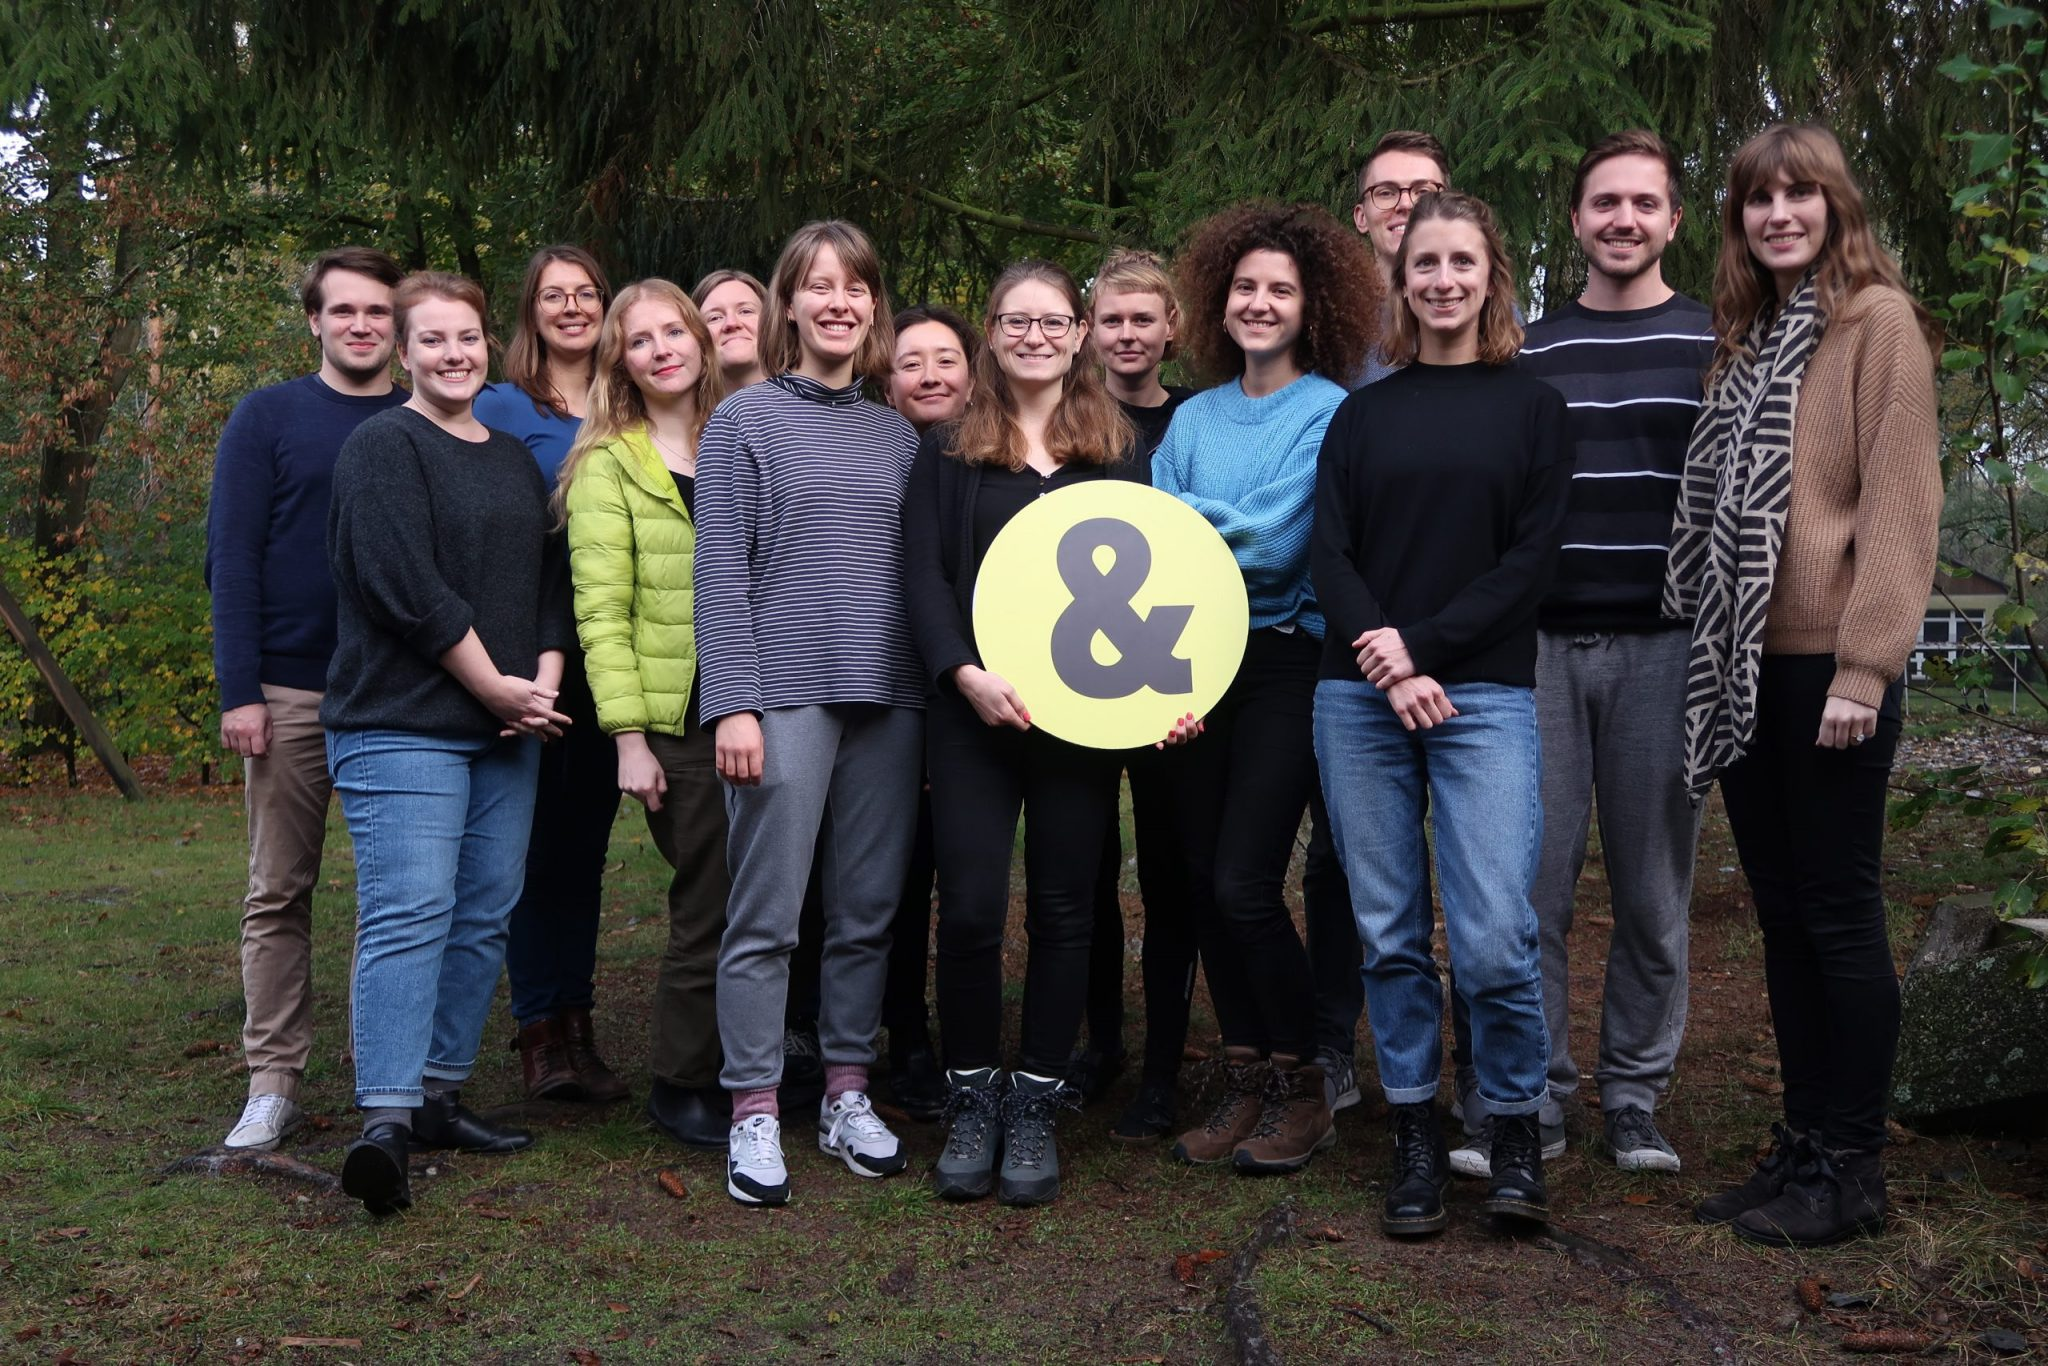 Das Team des Schülerpaten Berlin e.V. 2019. Foto: Schülerpaten Berlin e.V.